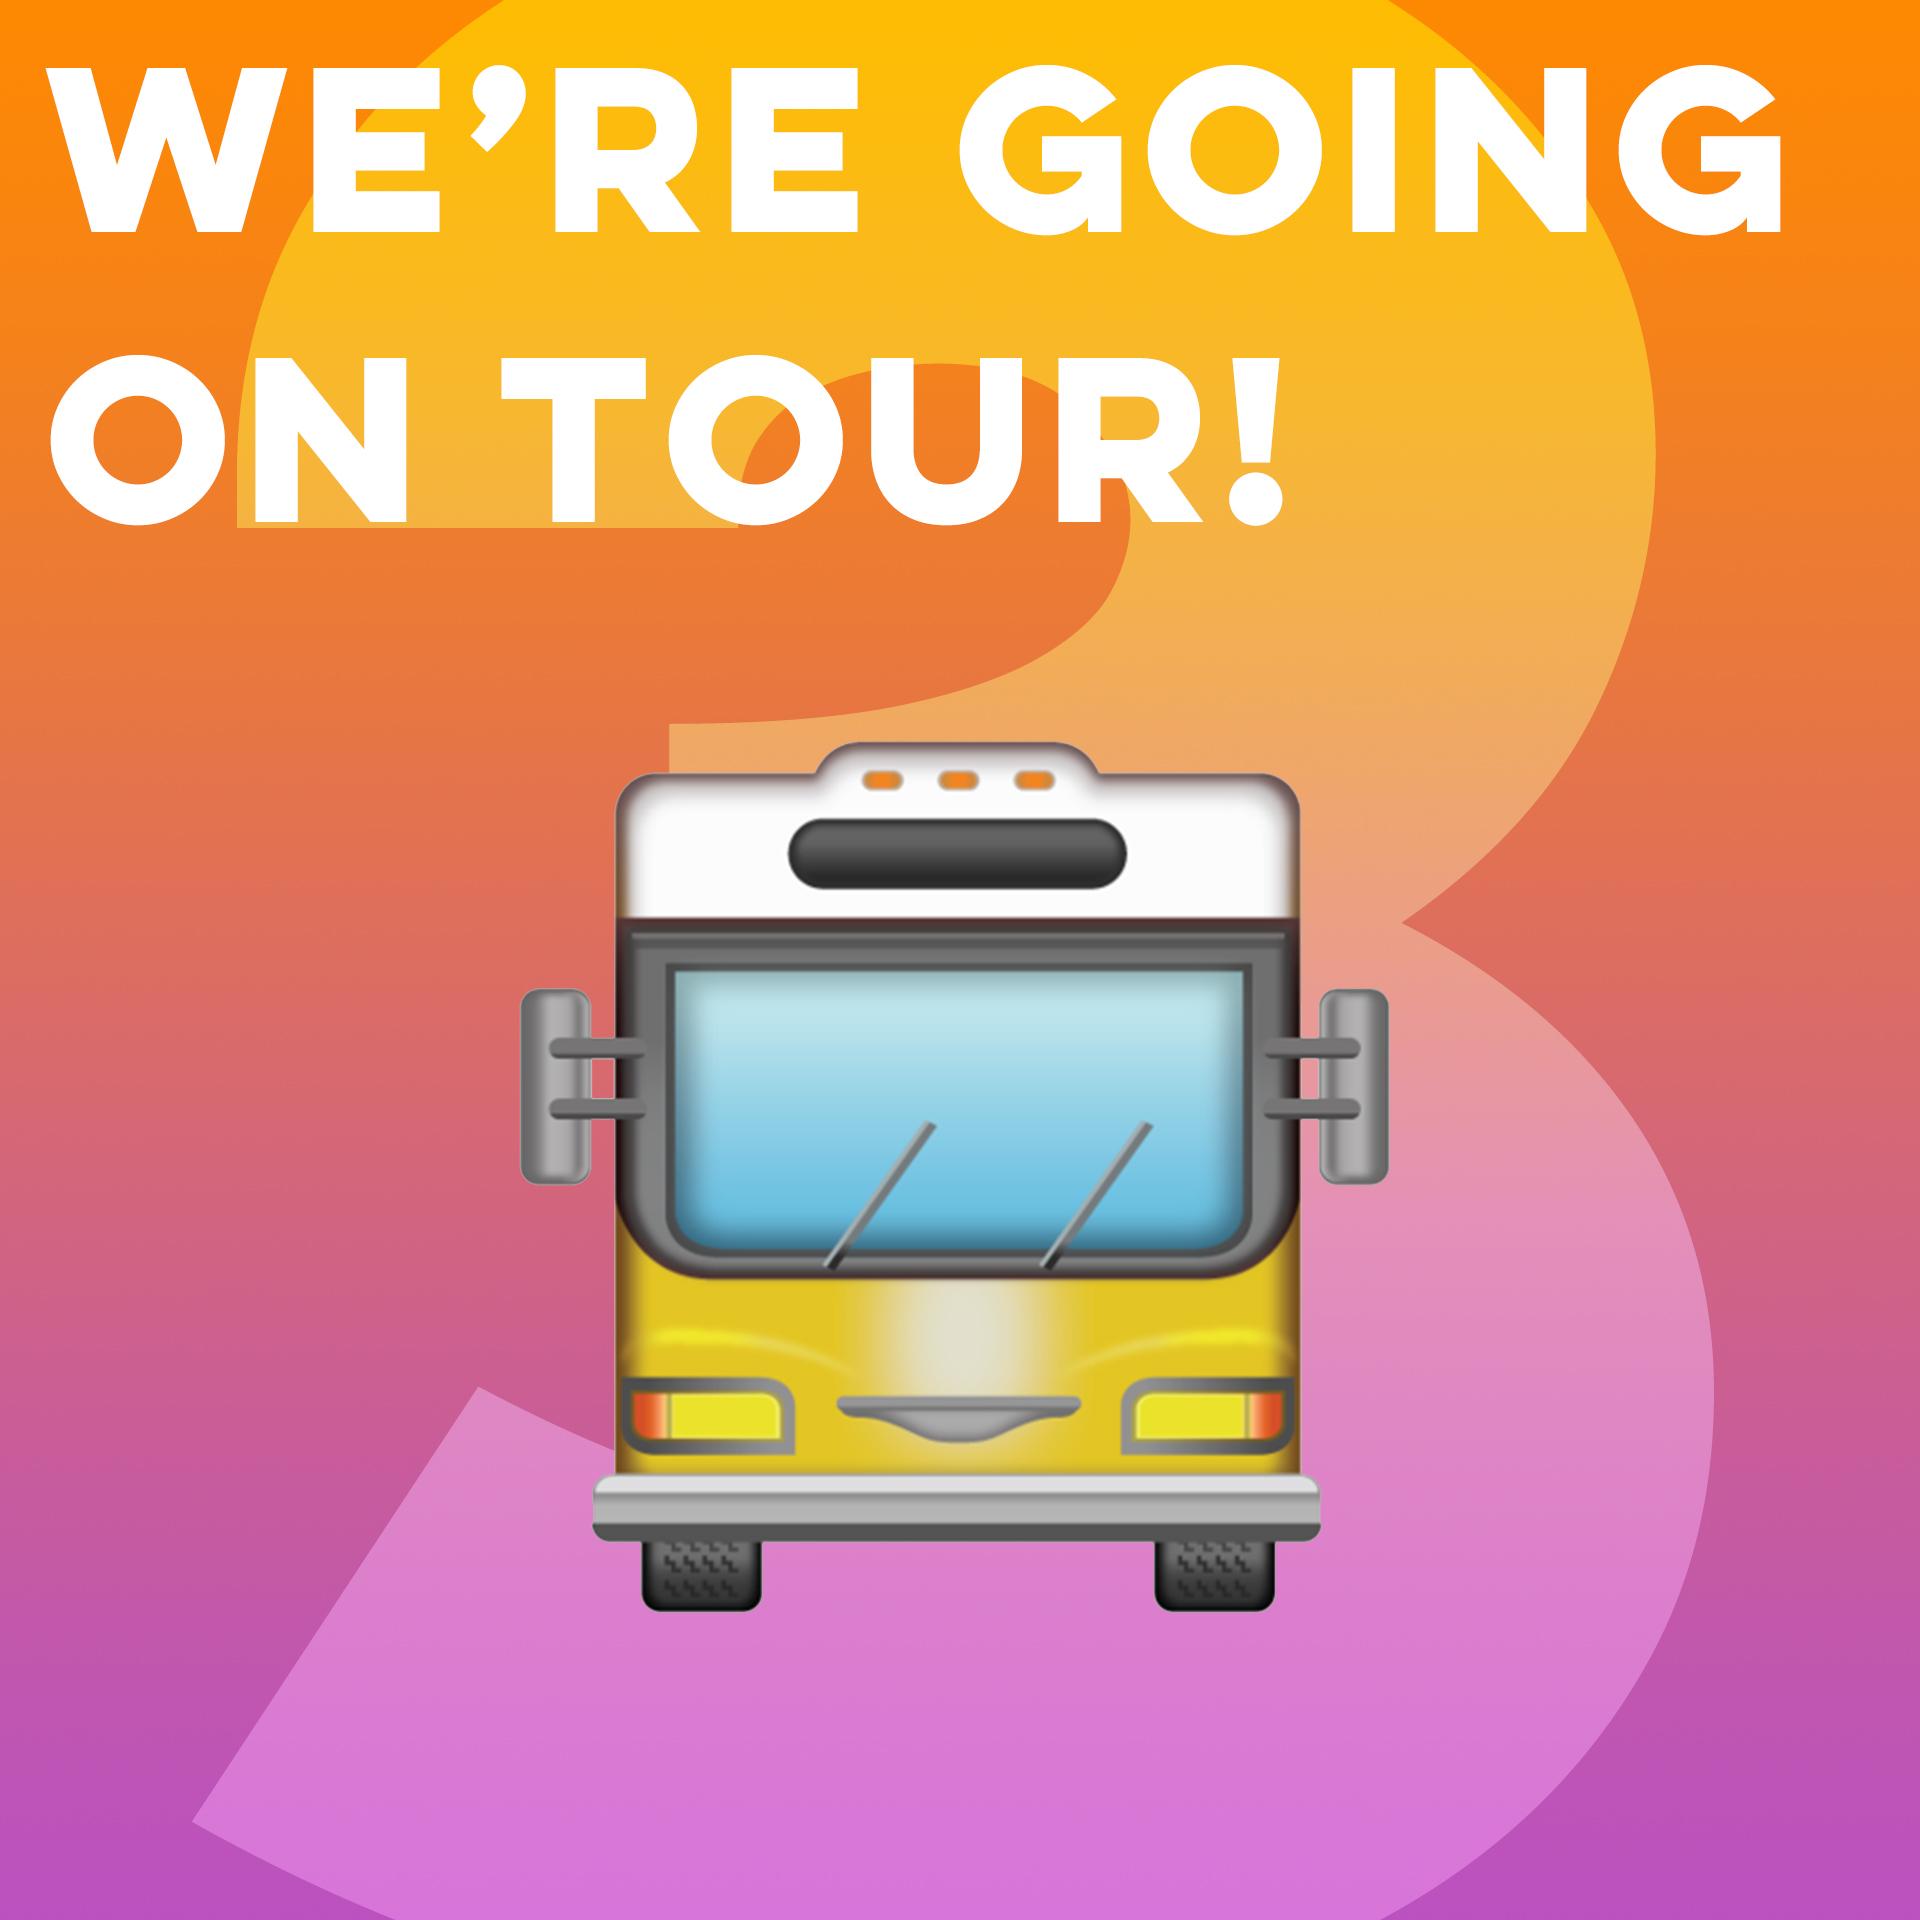 Were Going On Tour Vol. 3 Art.jpg